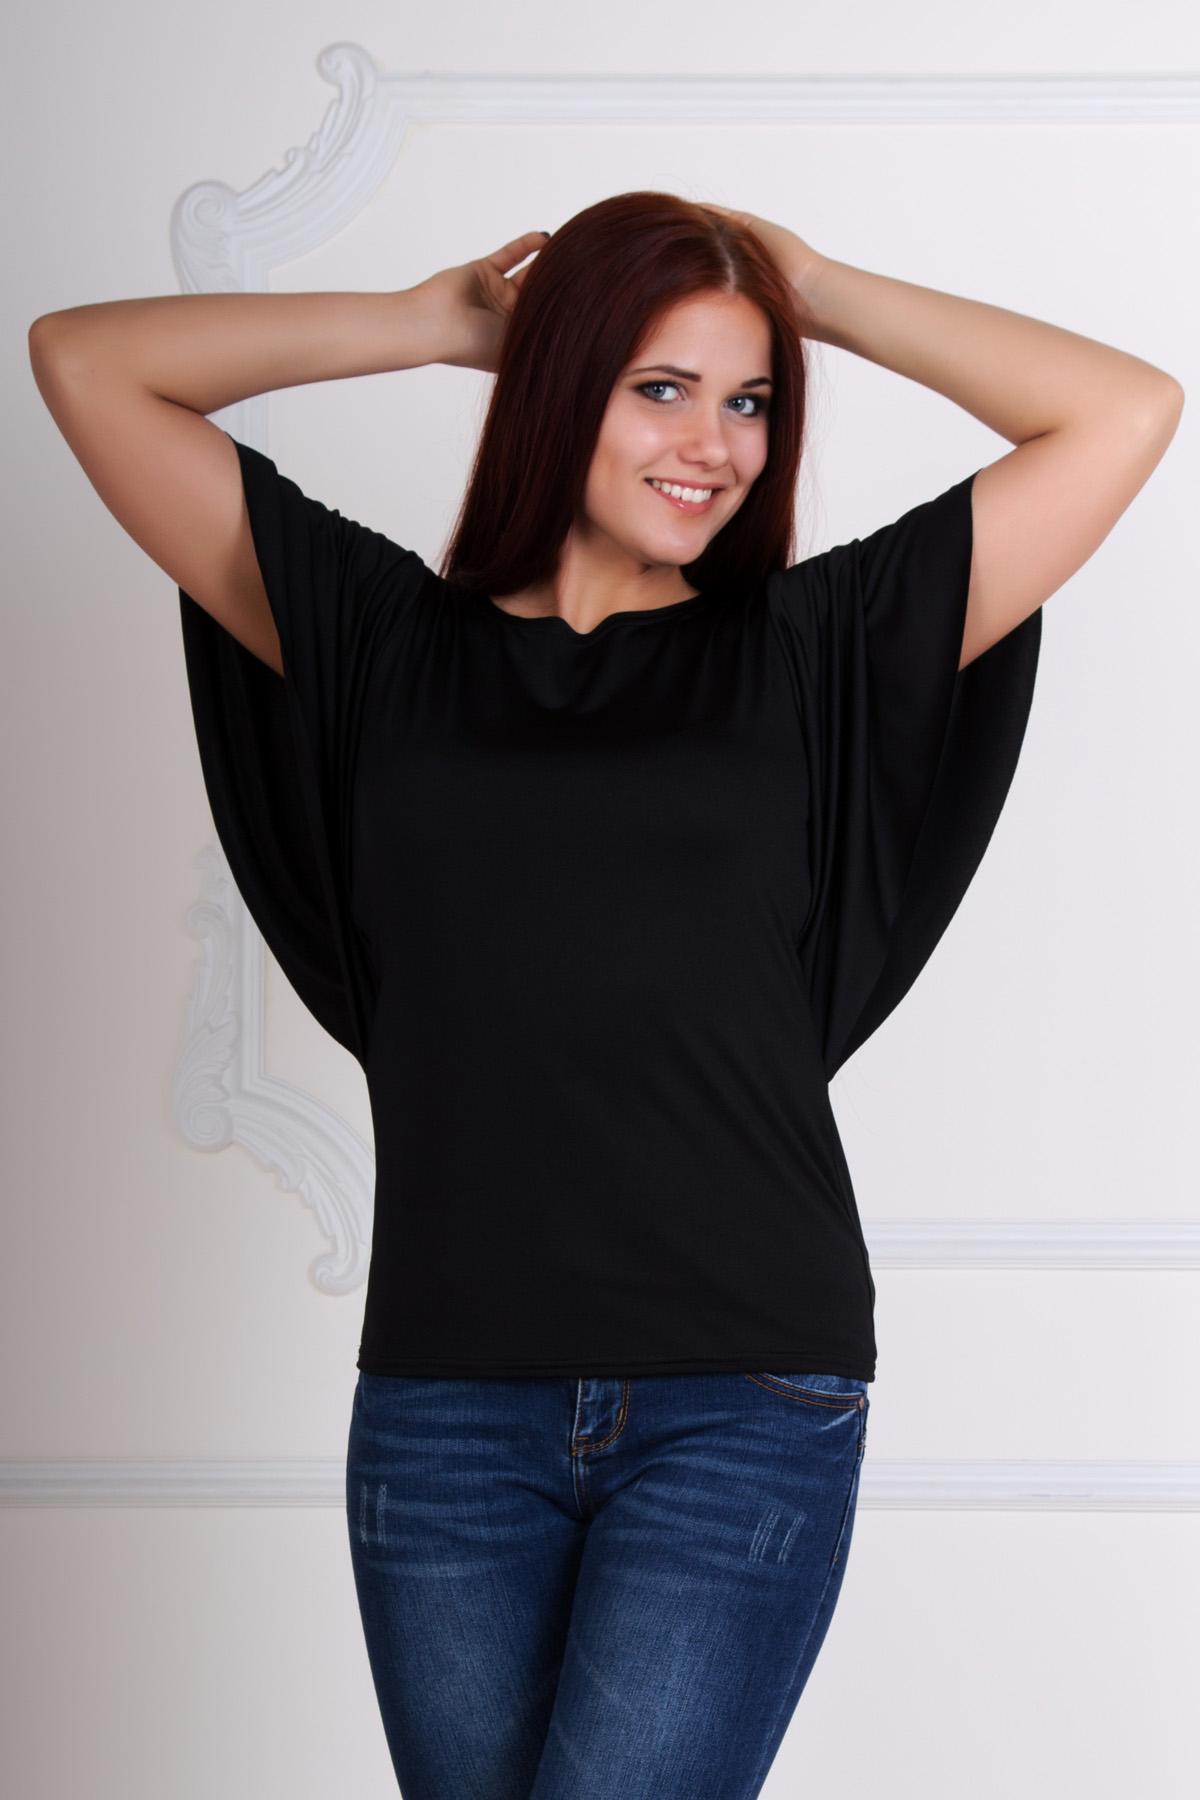 Жен. блуза Кармен р. 52Блузы<br>Обхват груди:104 см<br>Обхват талии:85 см<br>Обхват бедер:112 см<br>Длина по спинке:61 см<br>Рост:167 см<br><br>Тип: Жен. блуза<br>Размер: 52<br>Материал: Масло